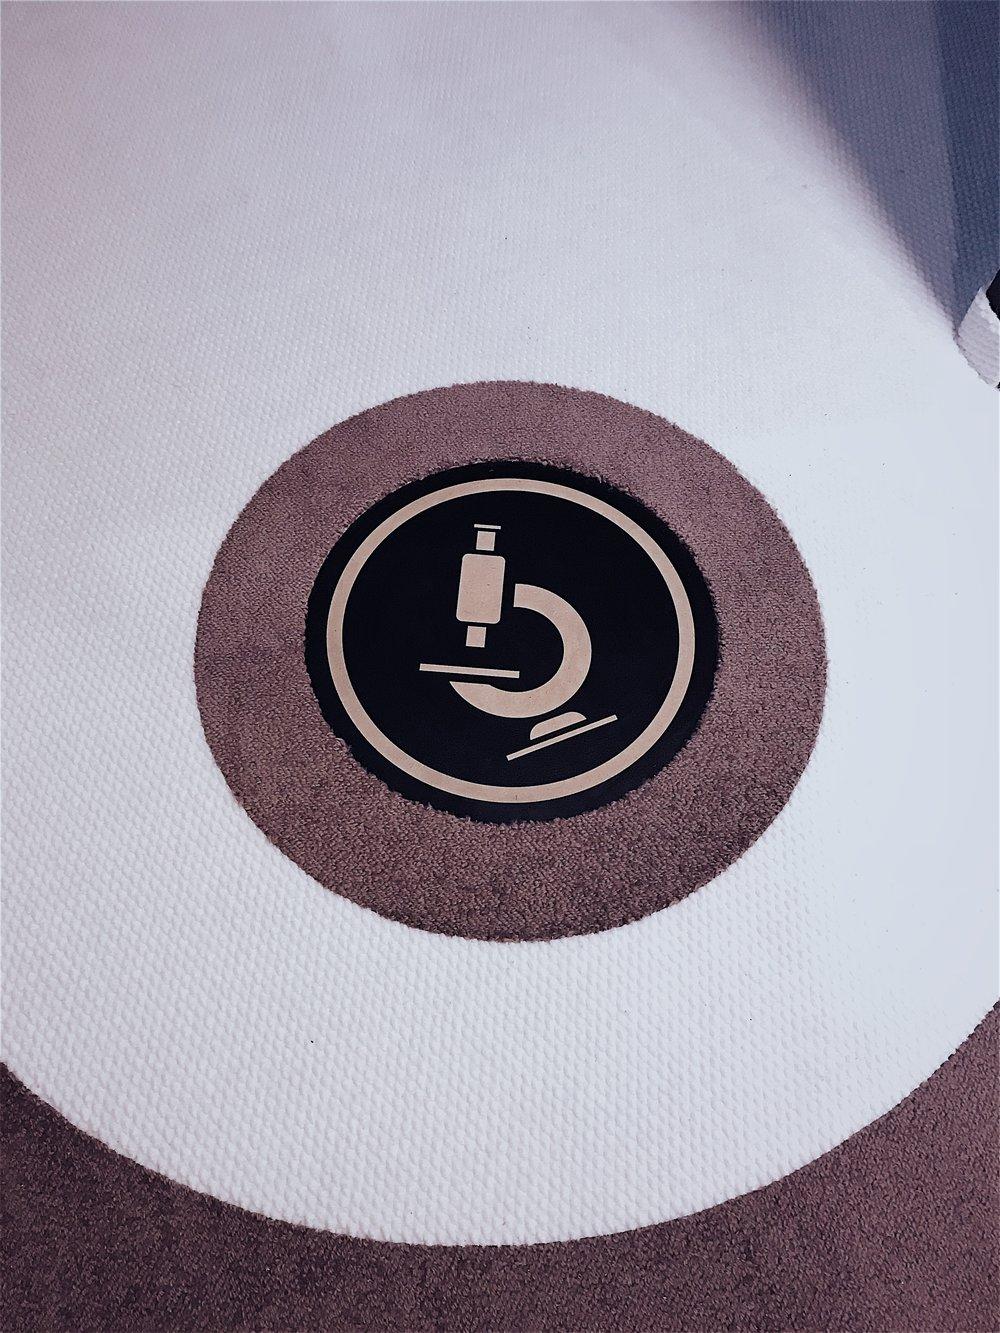 branded-carpet